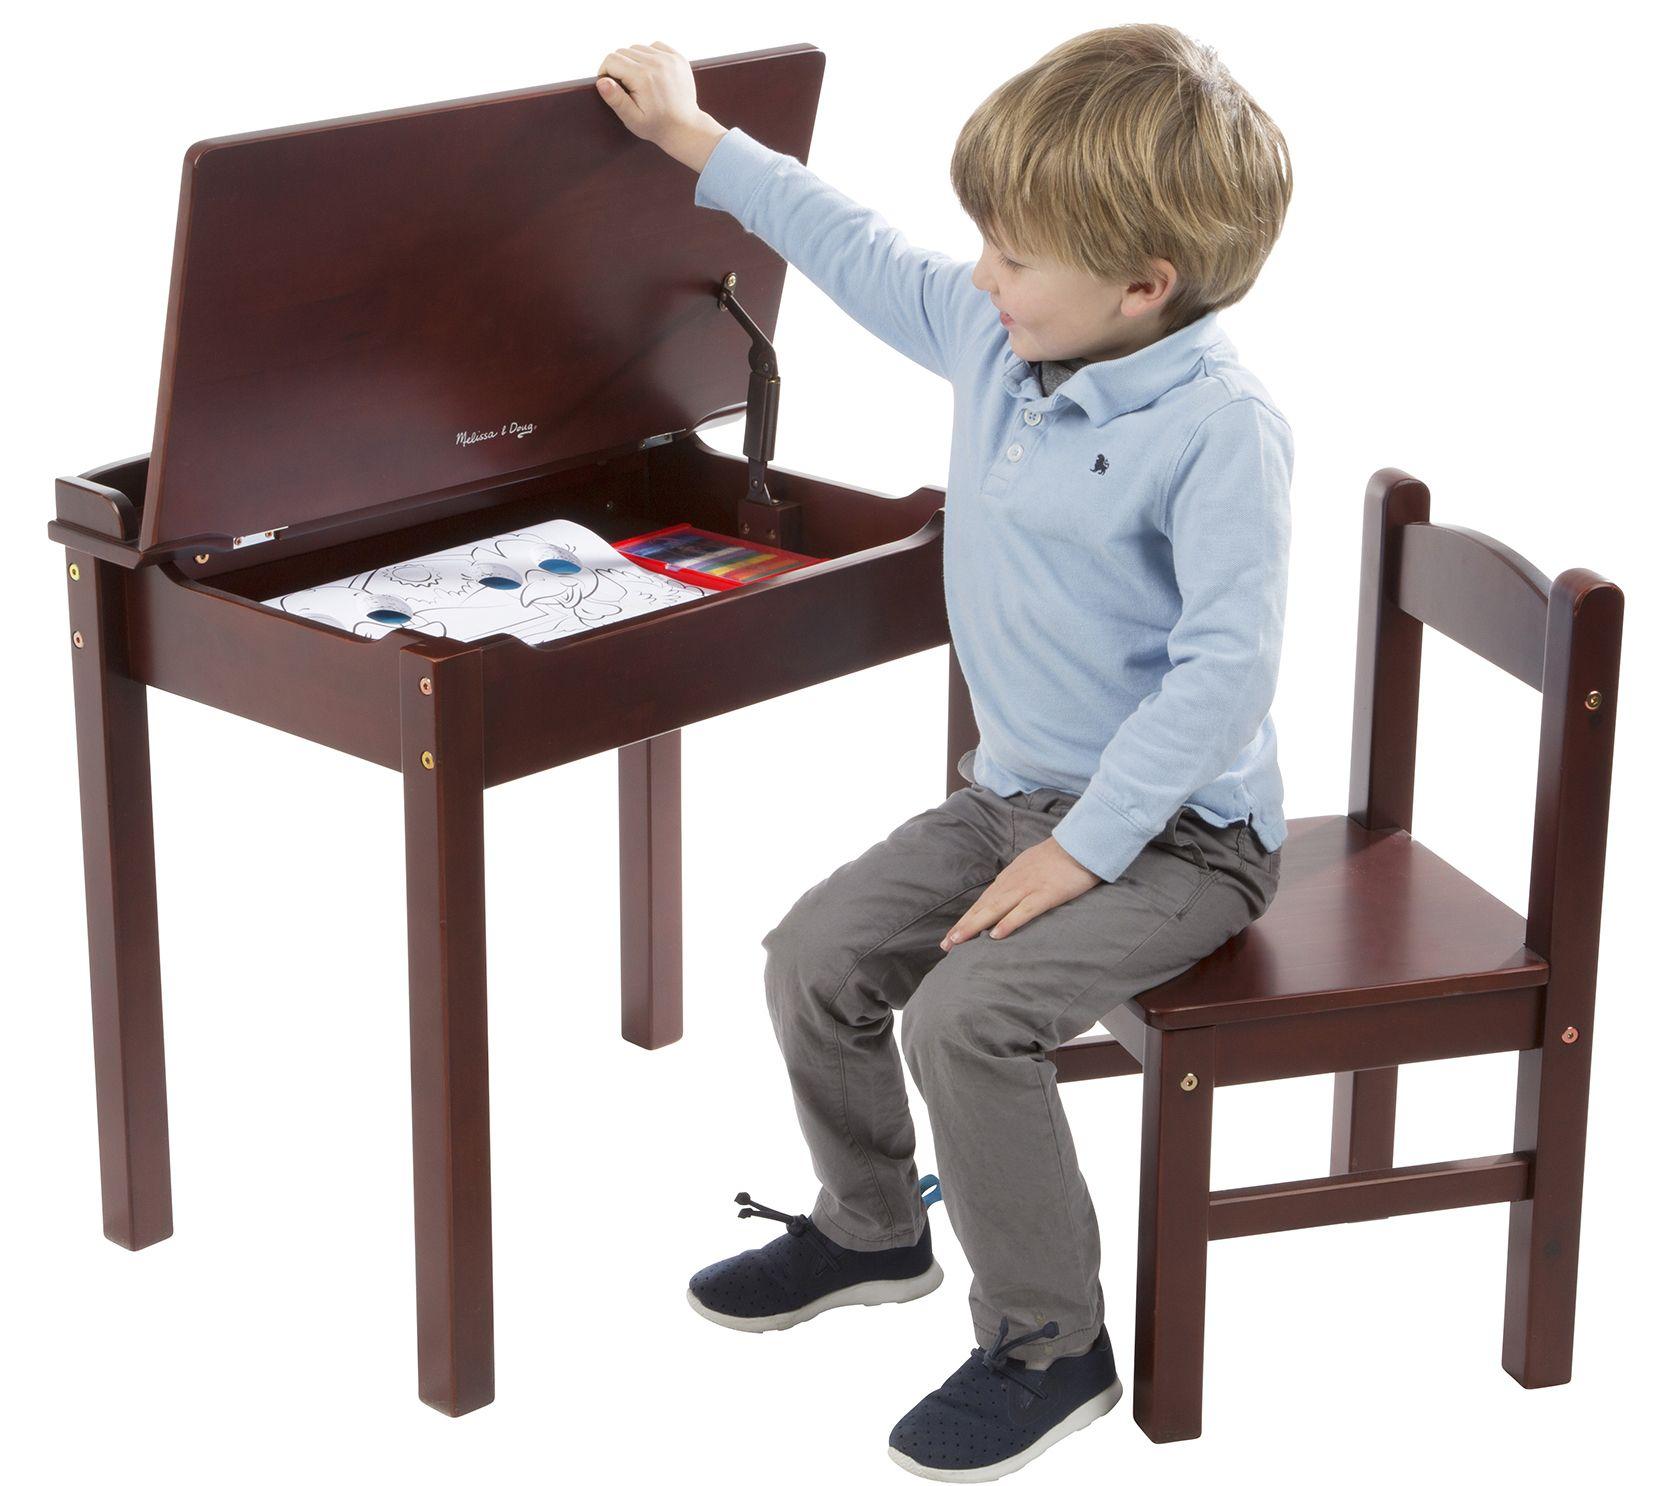 office chair qvc ergonomic chairs phoenix melissa and doug wooden lift top desk